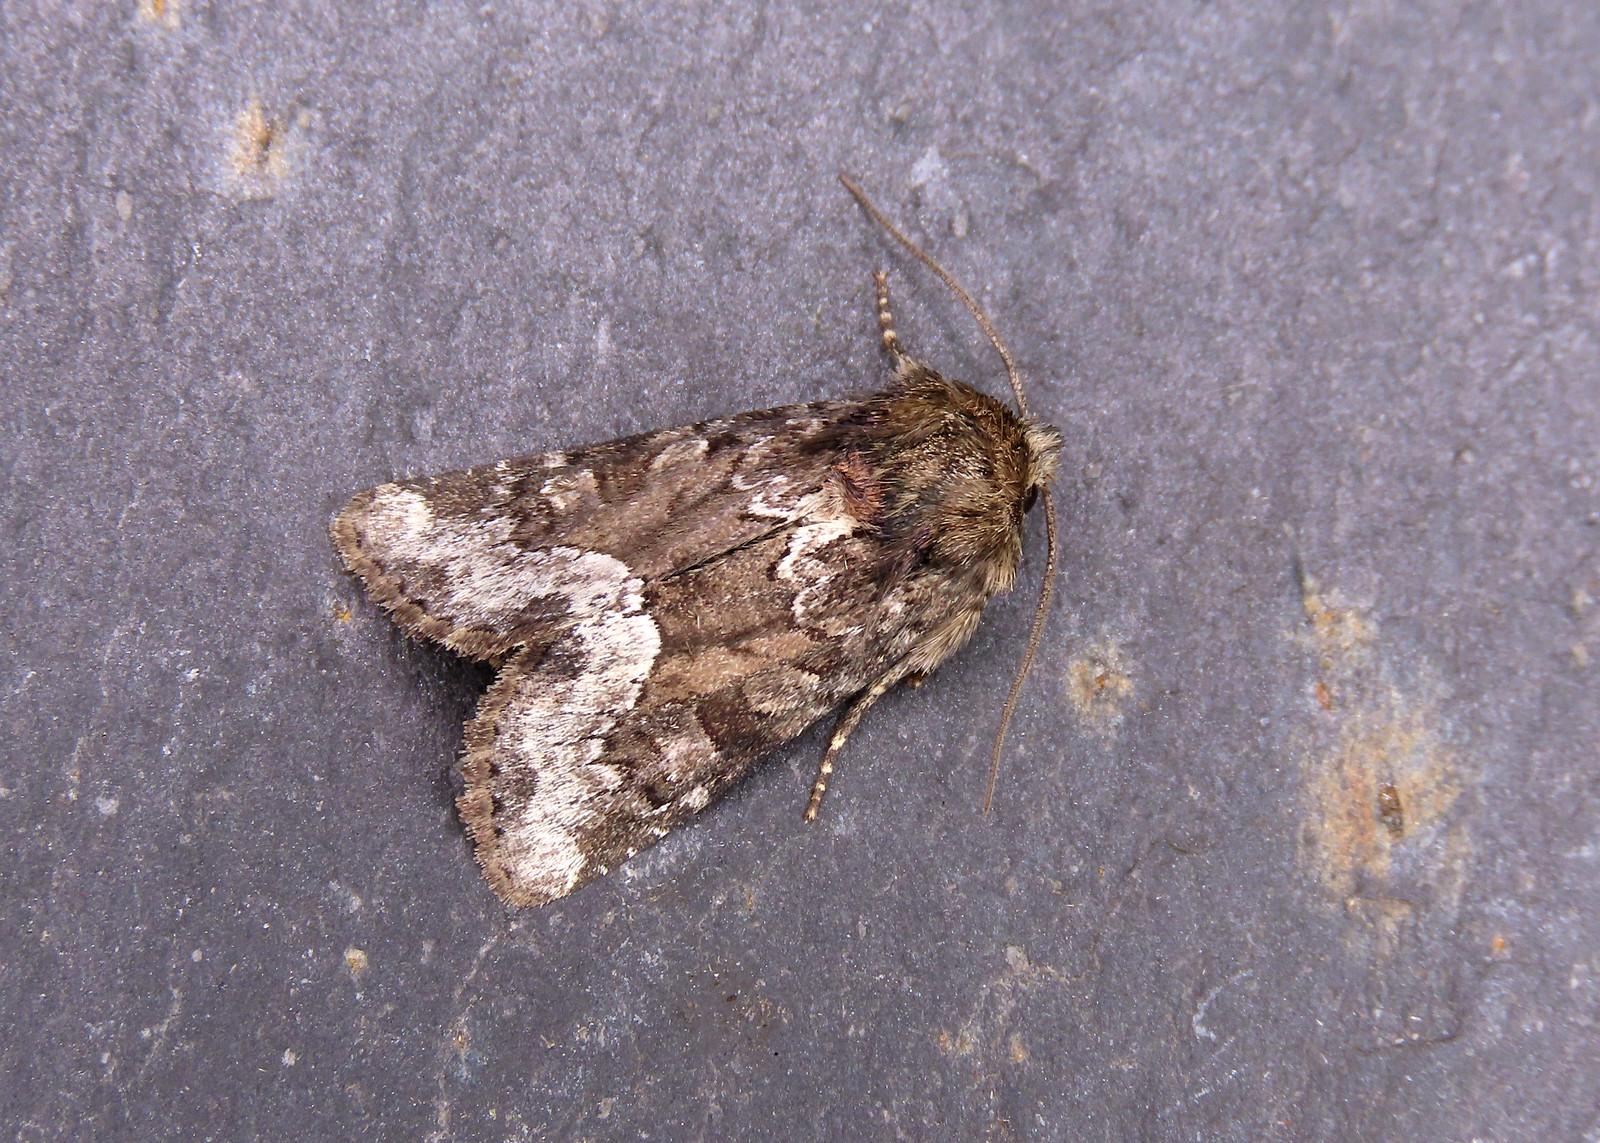 73.173x Marbled Minor agg. - Oligia strigilis agg.